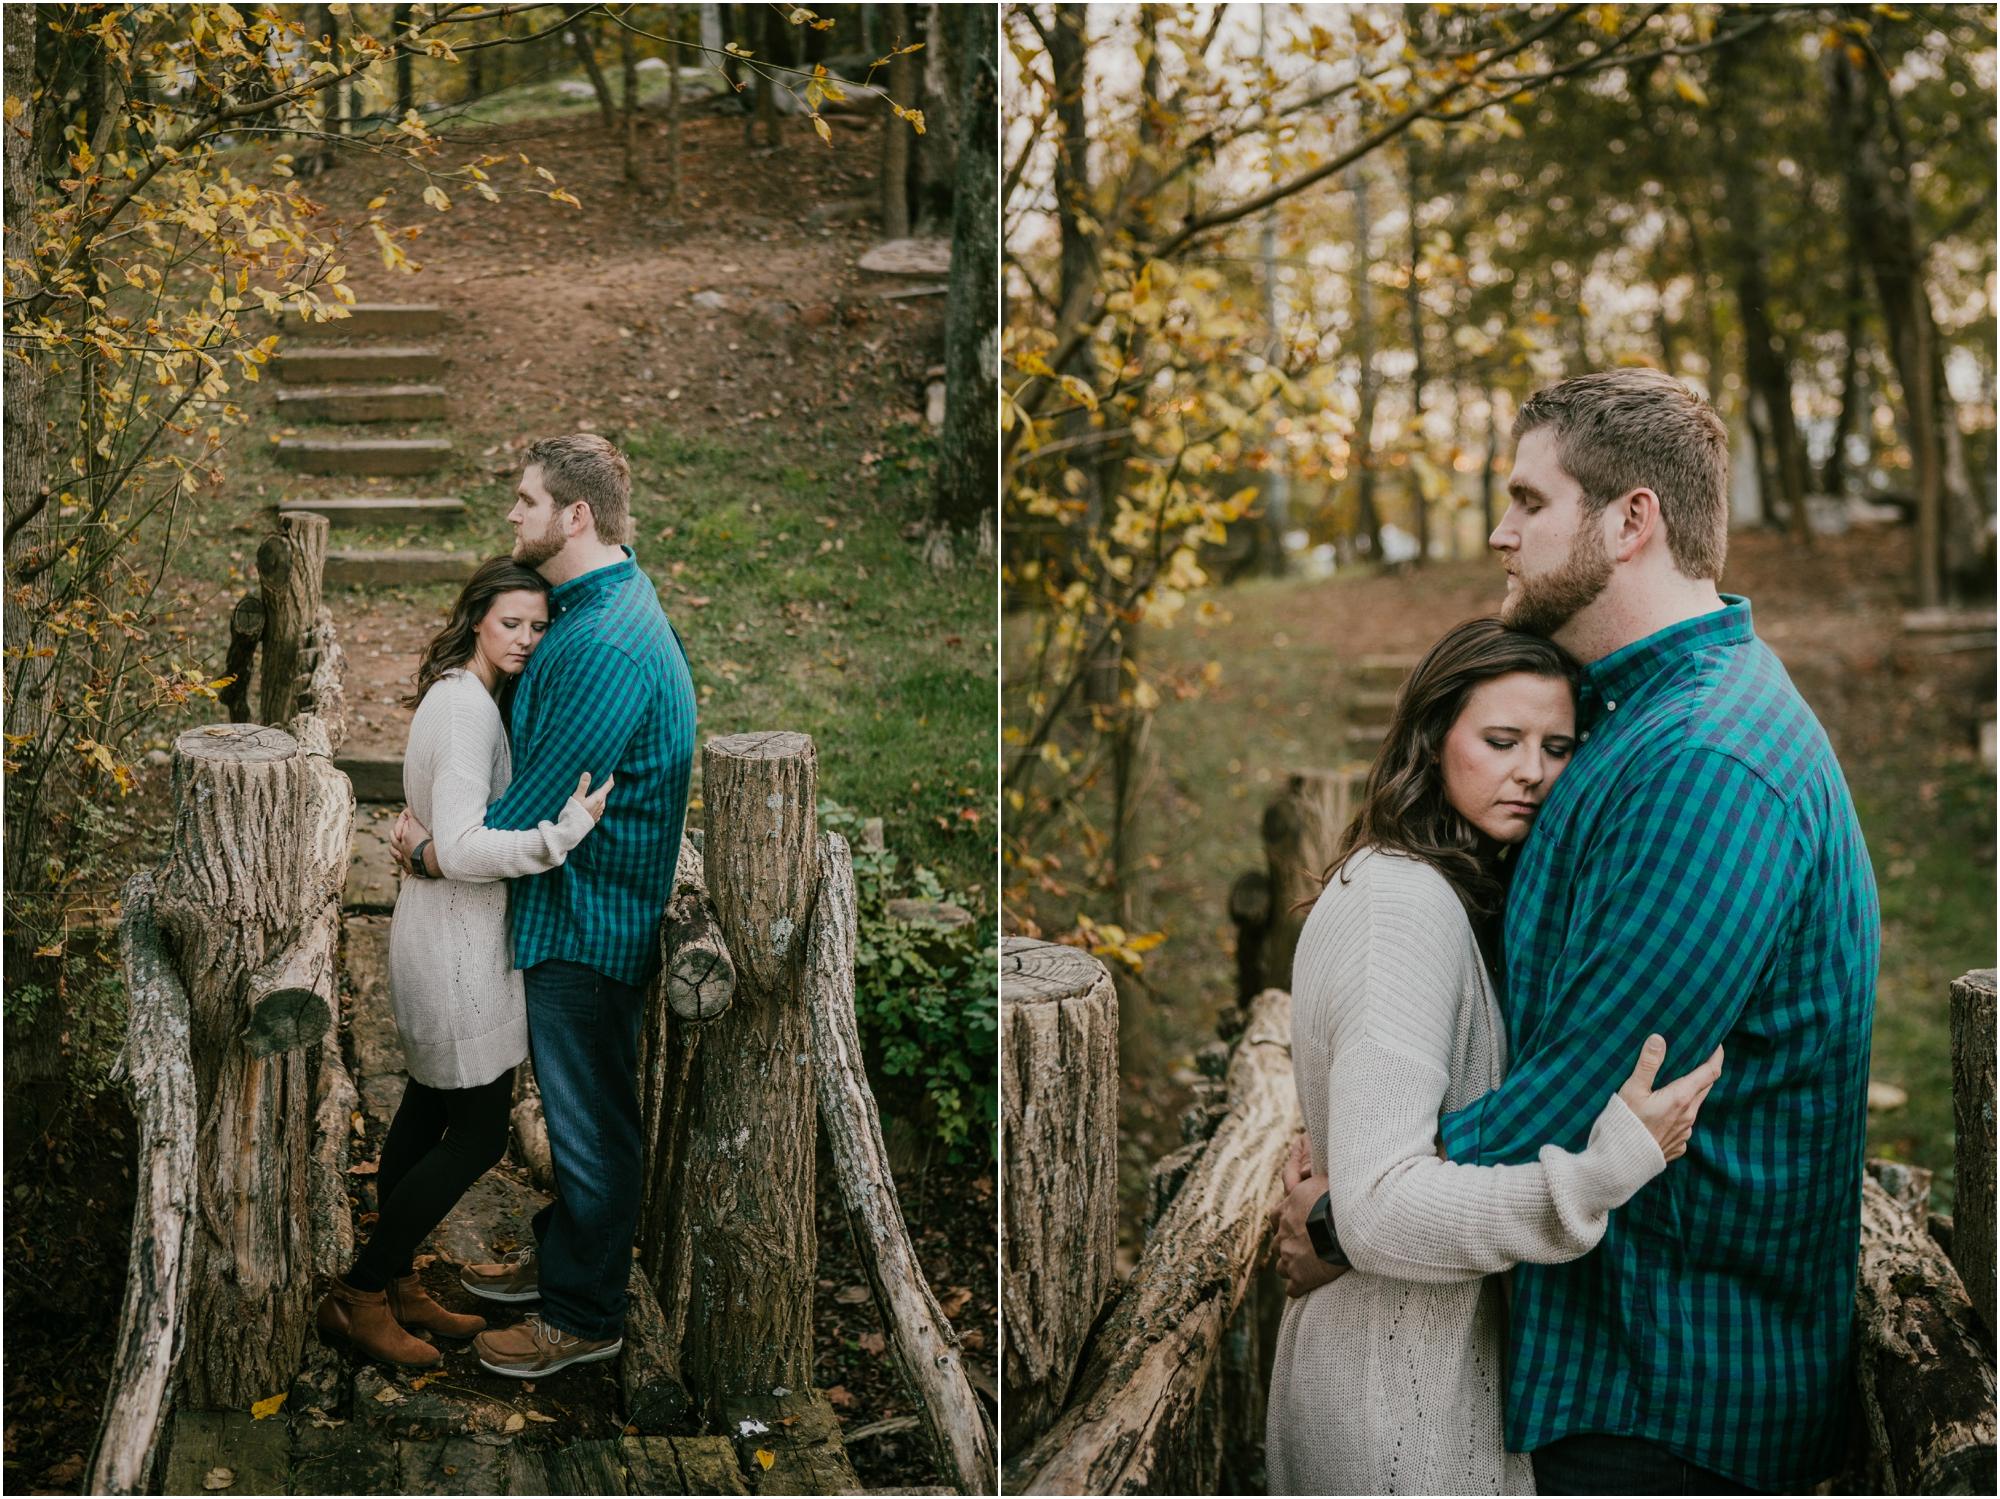 katy-sergent-millstone-limestone-tn-rustic-fall-engagement-session-adventurous-outdoors-intimate-elopement-wedding-northeast-johnson-city-photographer_0020.jpg